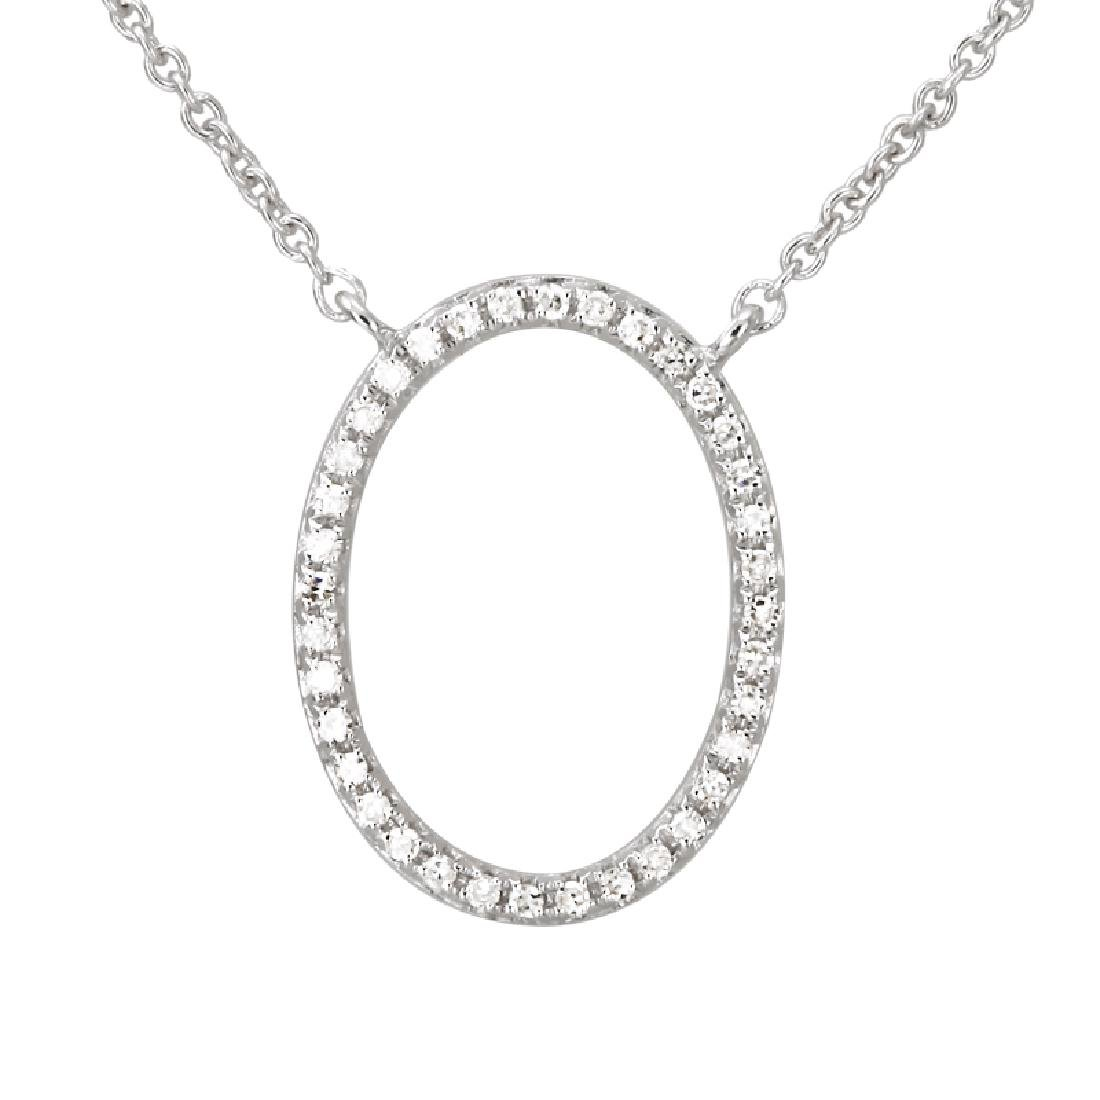 14KT White Gold Diamond Necklace - 2